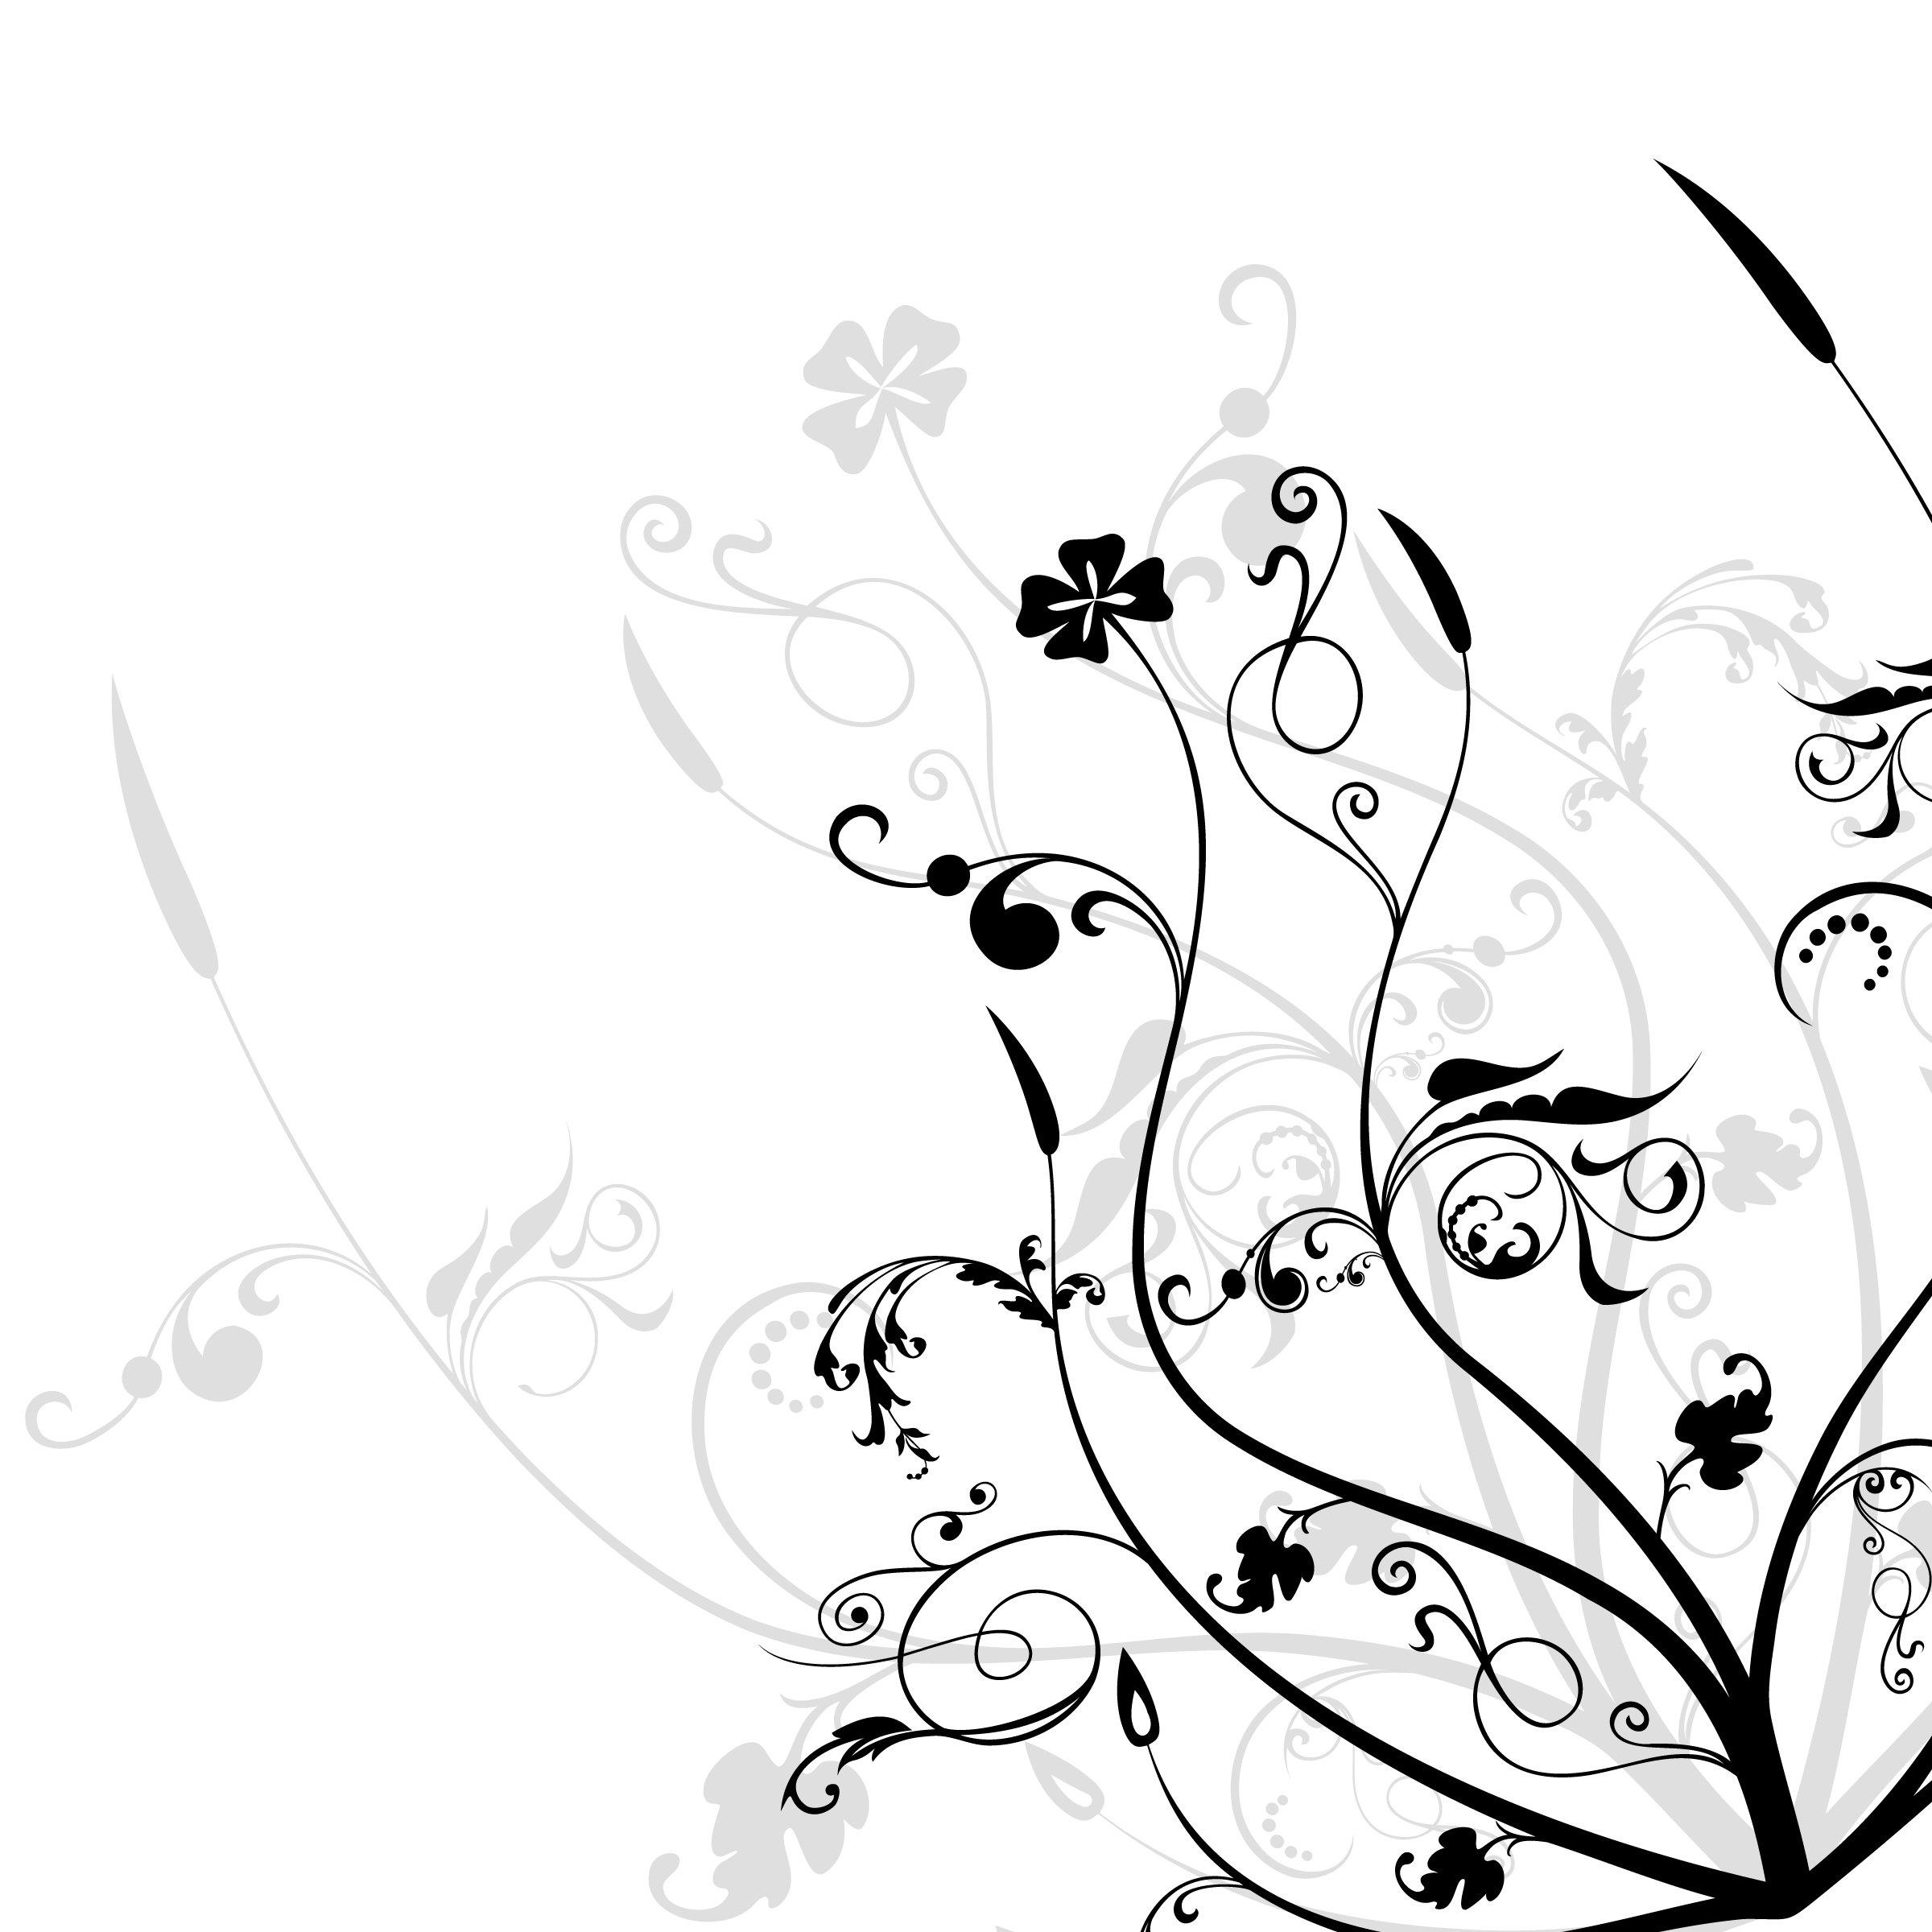 Black and white flowers wallpapers HD | PixelsTalk.Net